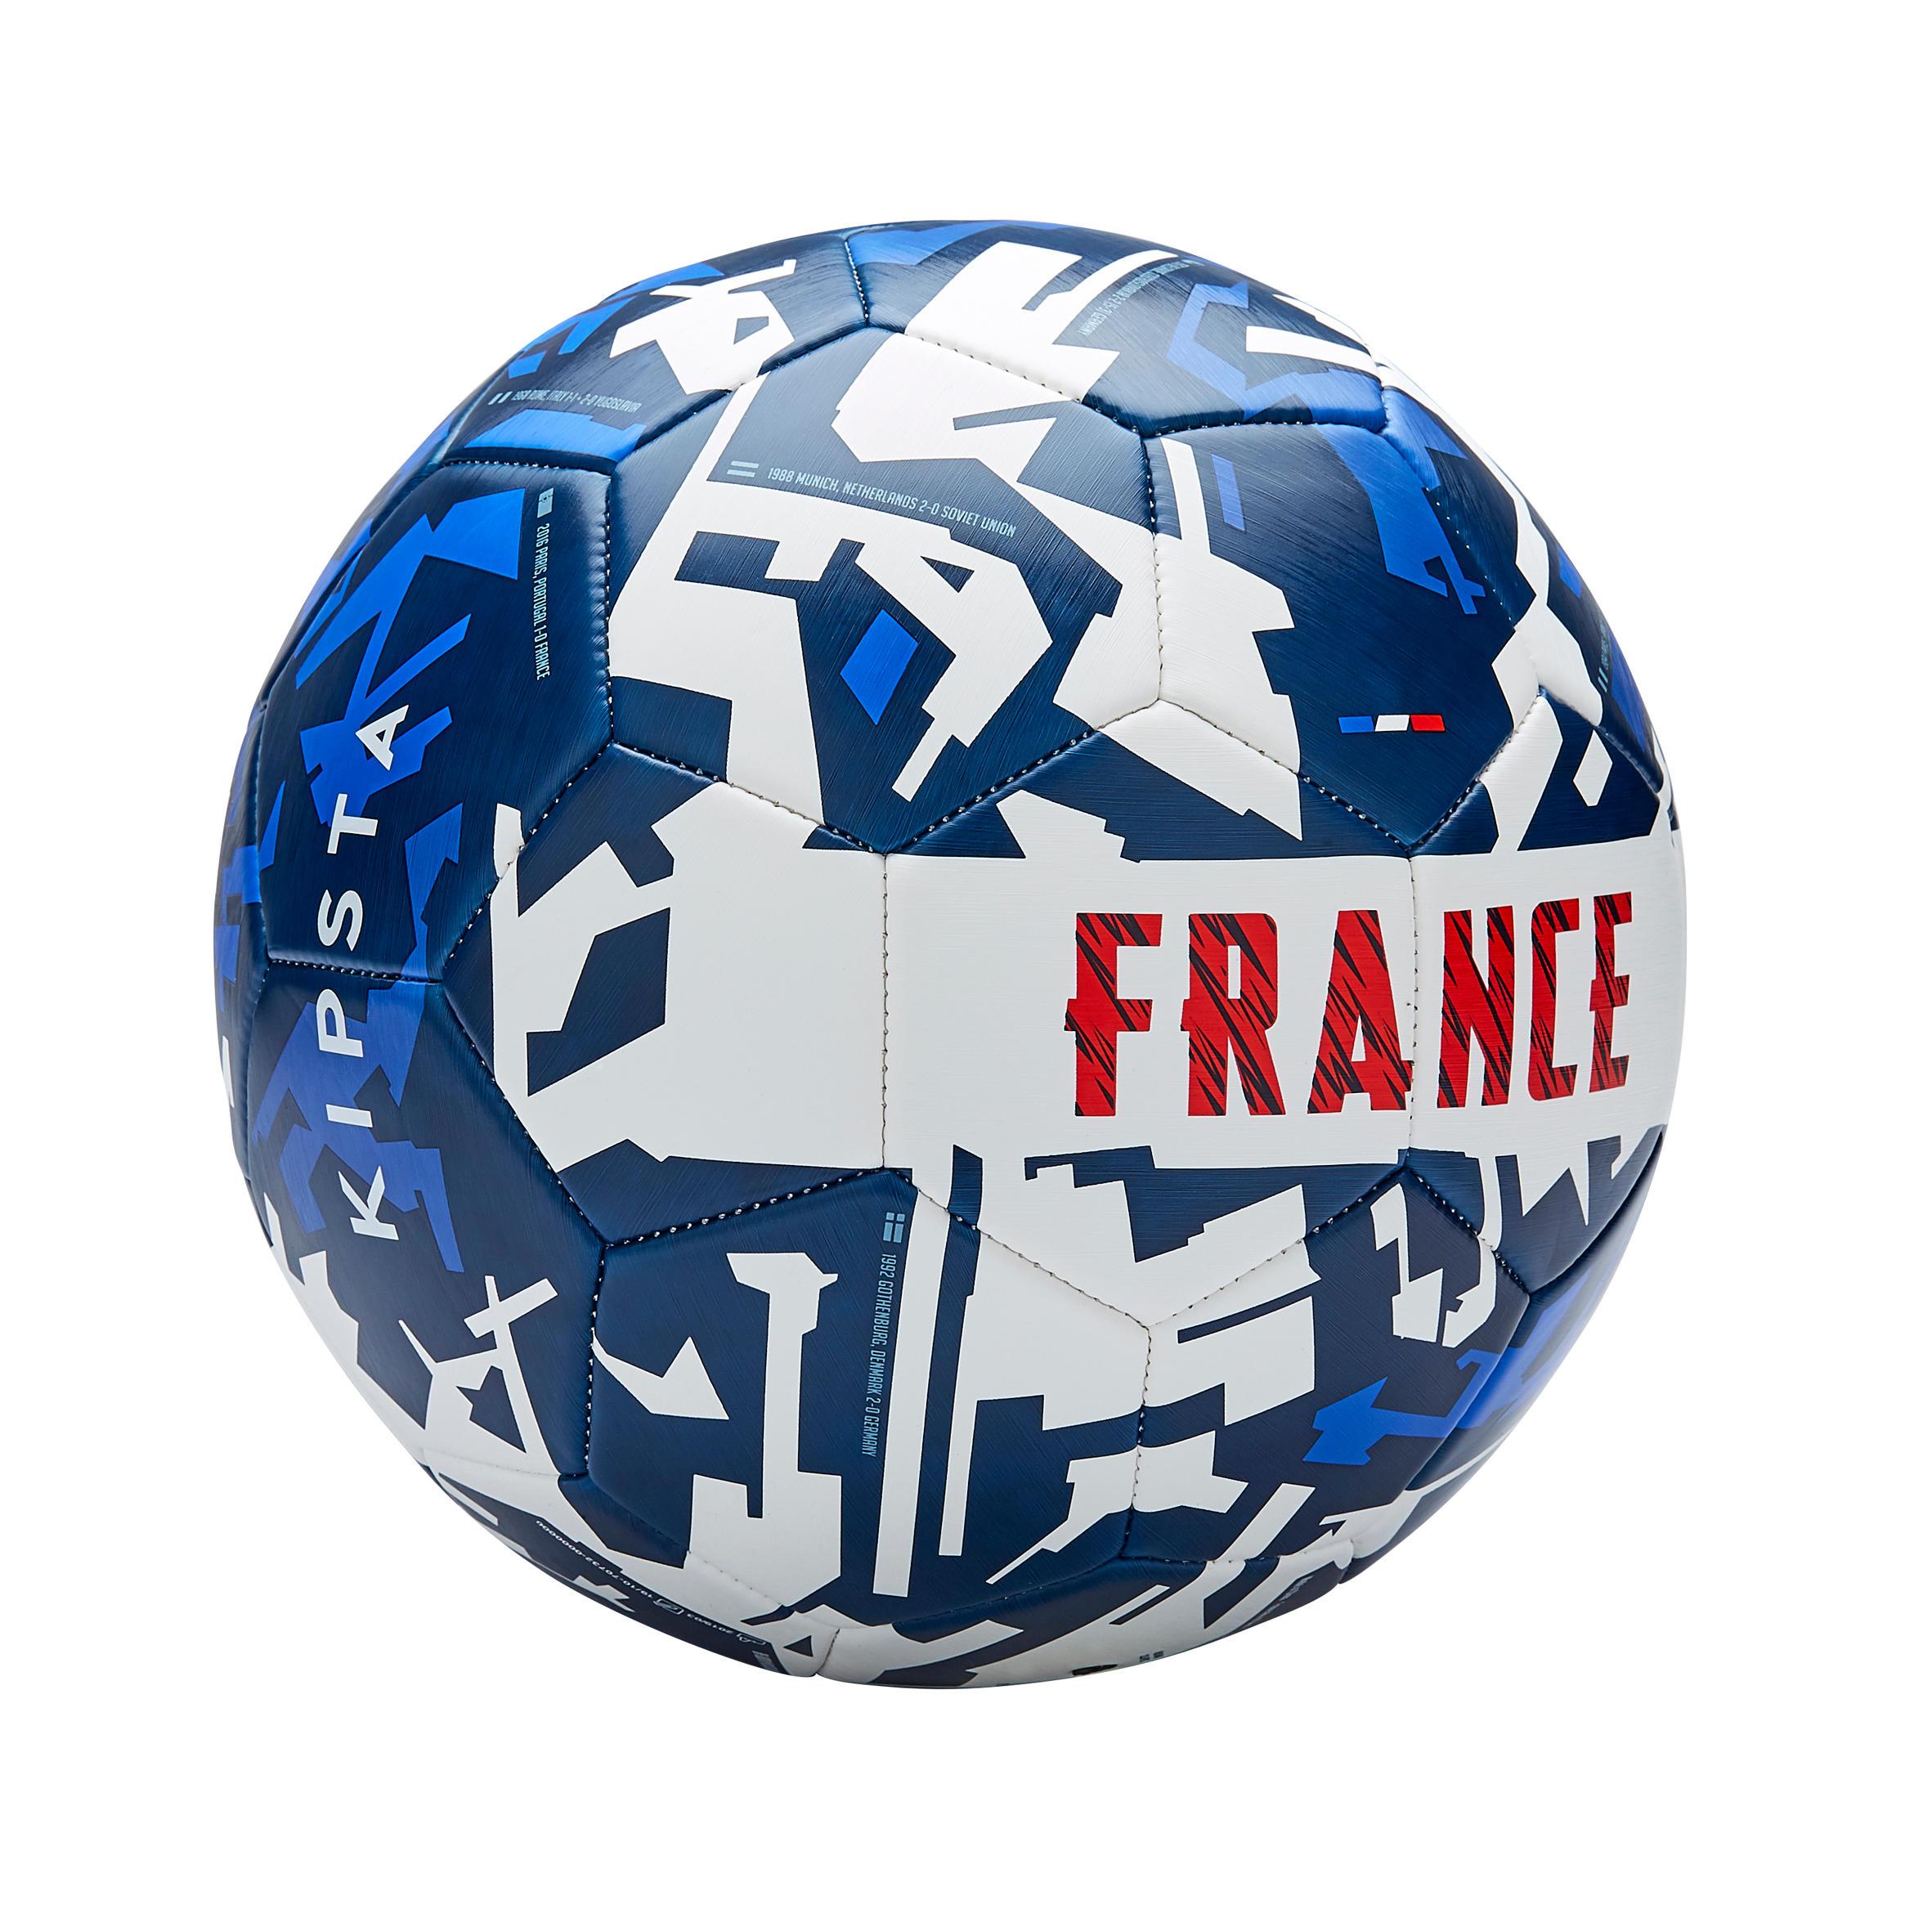 Minge Franța 2020 M5 la Reducere poza